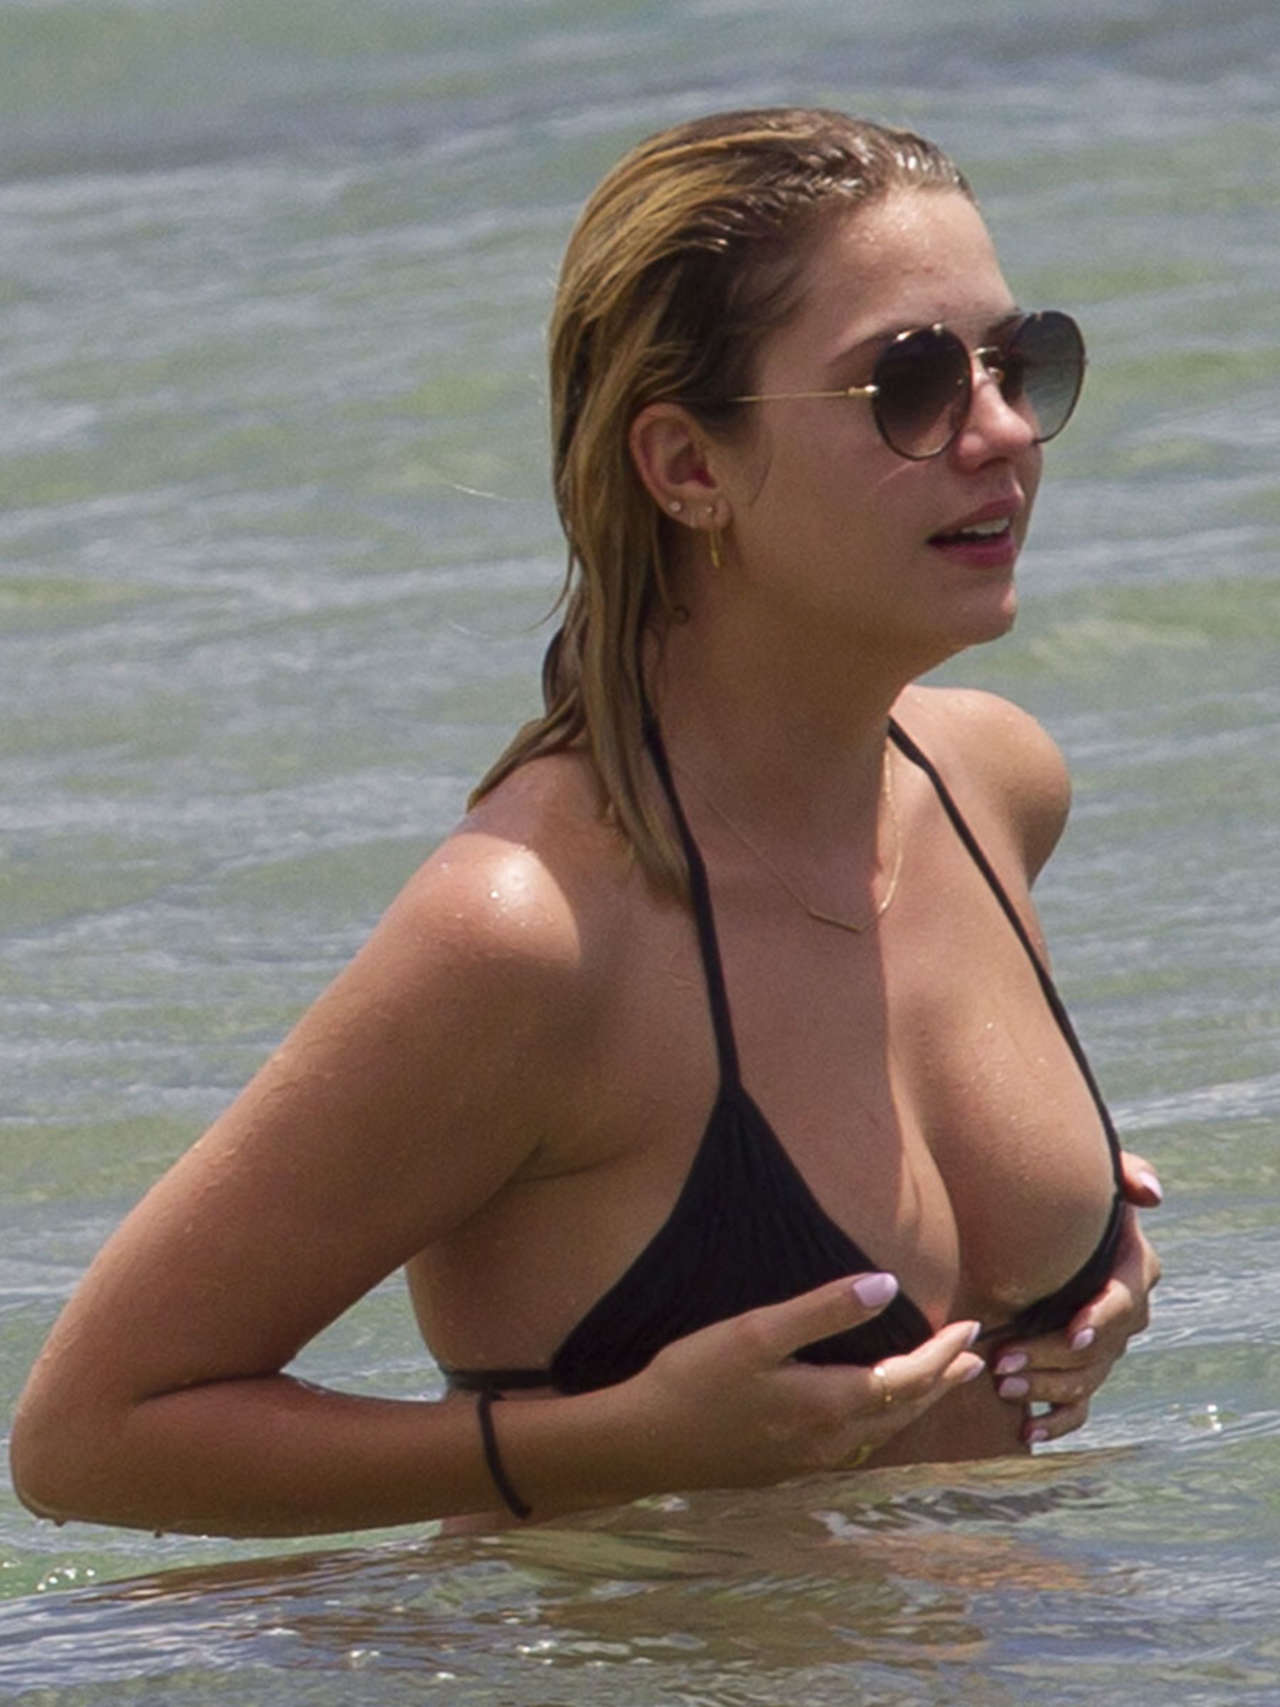 Ashley Benson 2014 : Ashley Benson and Shay Mitchell in Bikini -05